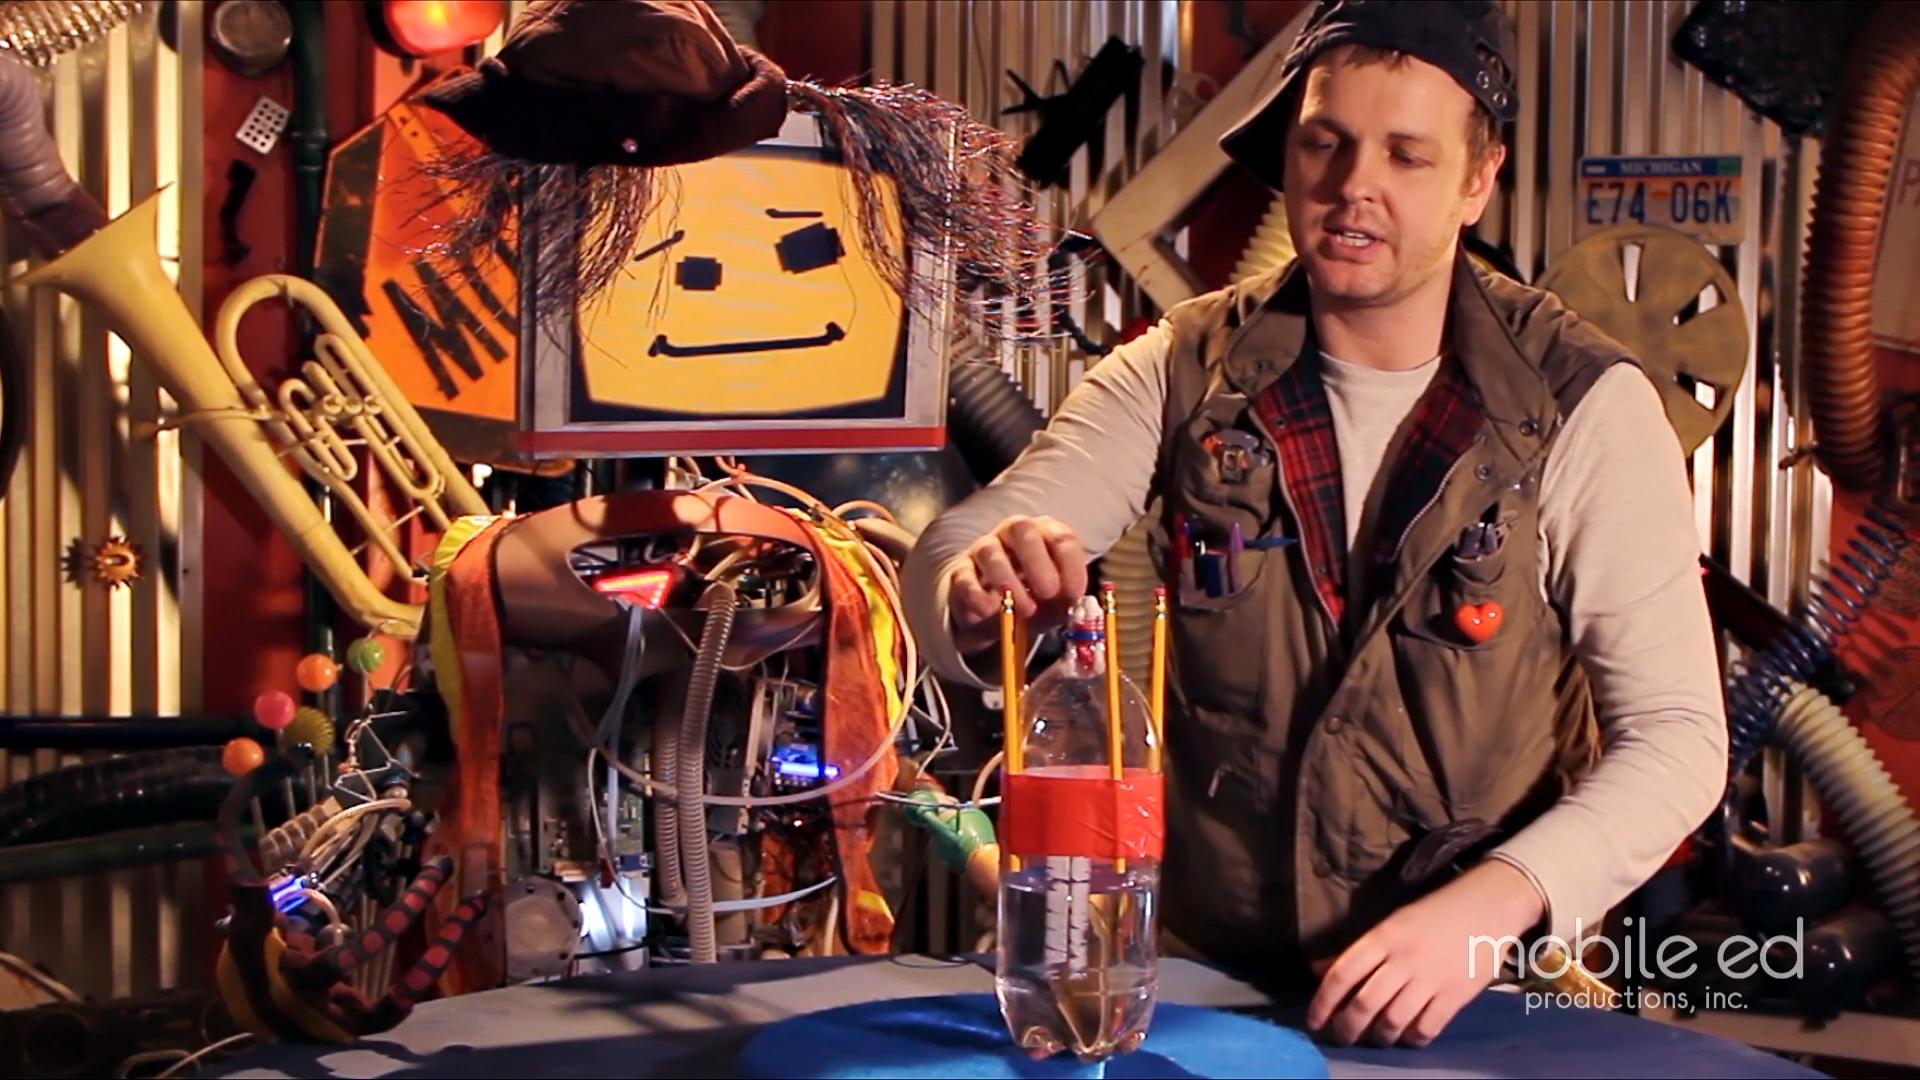 Build your own rocket - position the fuel packet  |  Handy Dan the Junkyard Man